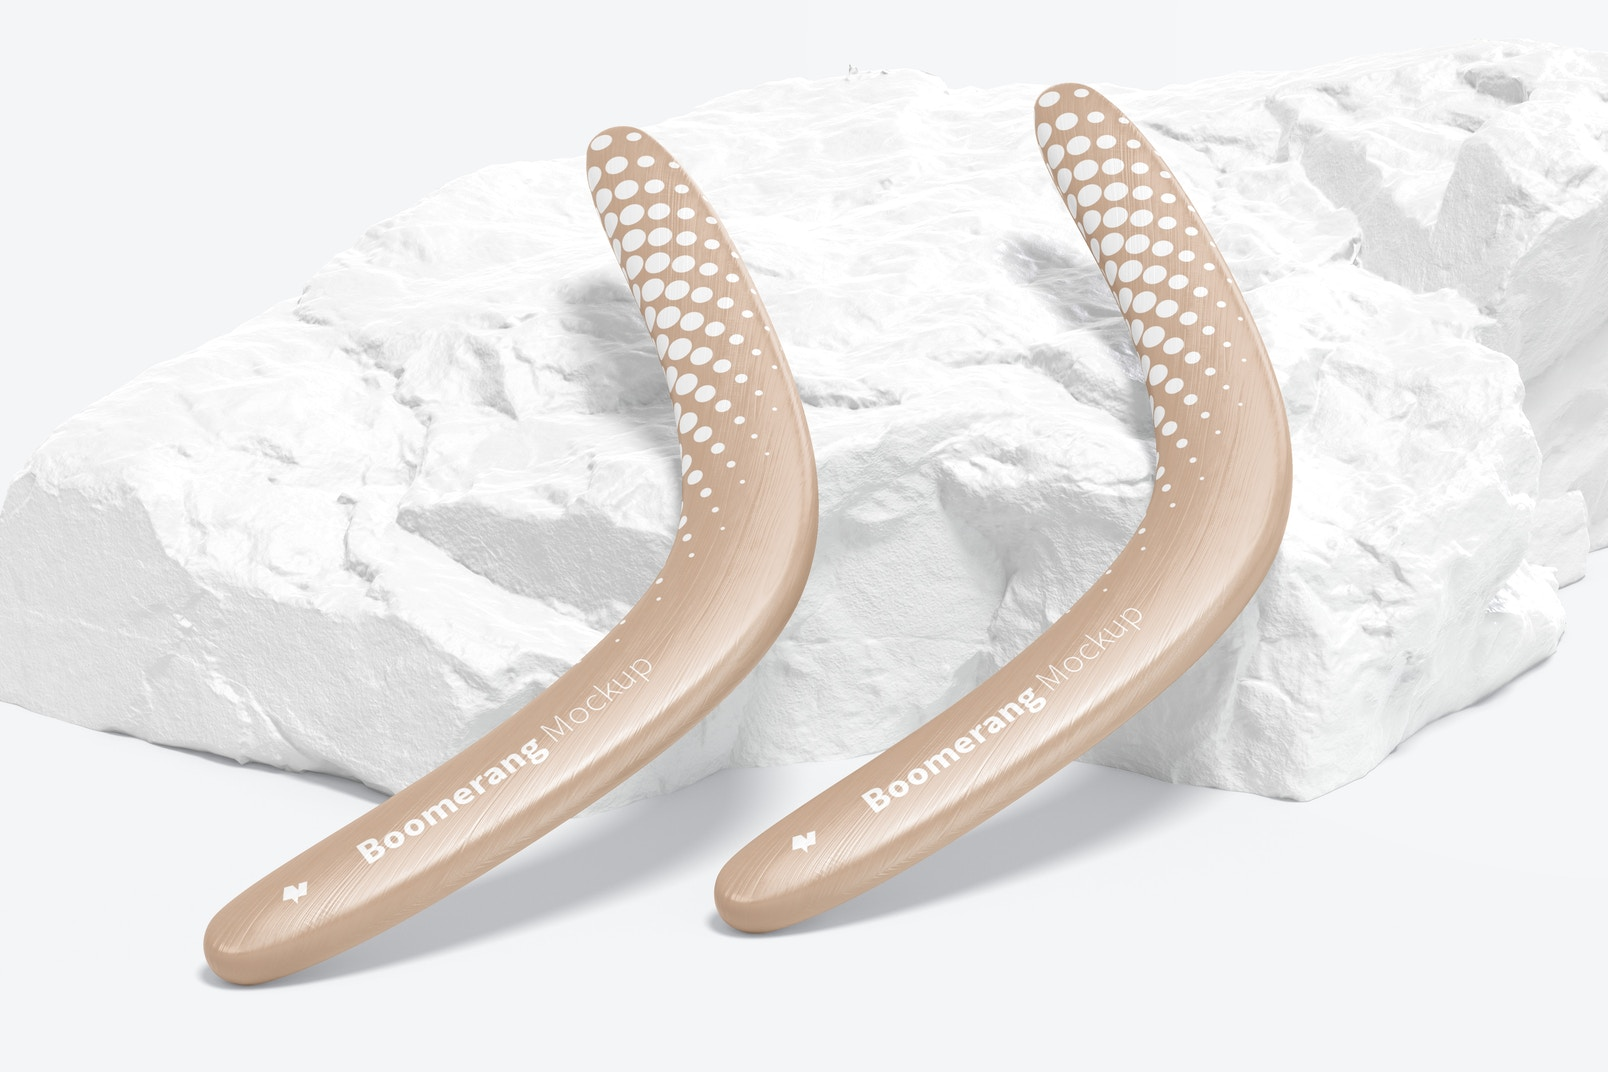 Boomerangs Mockup, Leaned